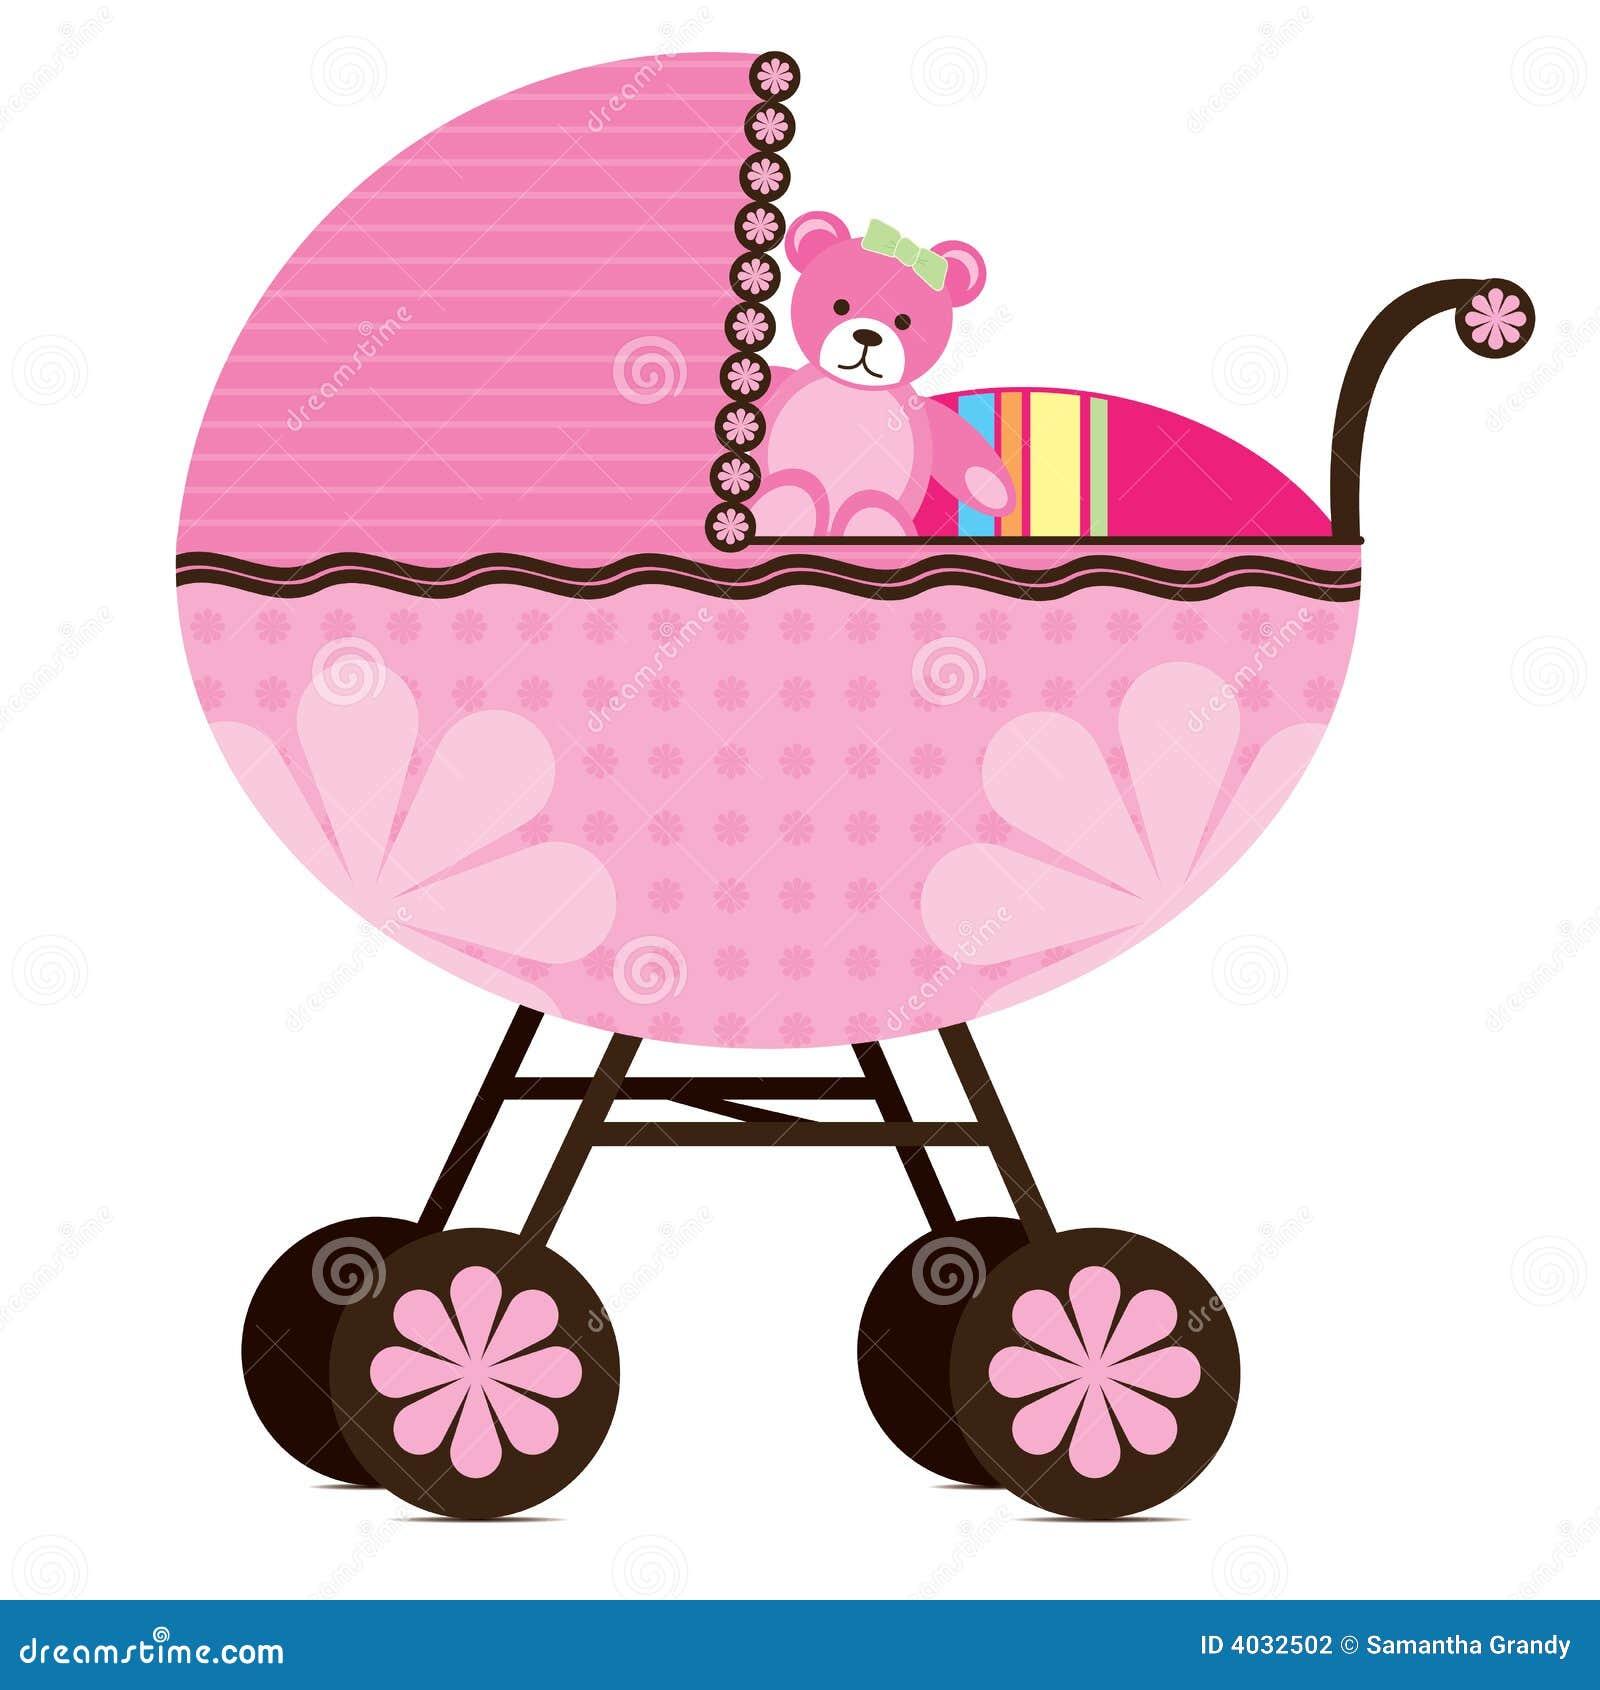 Muestras gratis para bebs, regalos y Muestras gratis Alimentacin infantil - Nestl Muestras, gratis, para, bebs - Baratuni